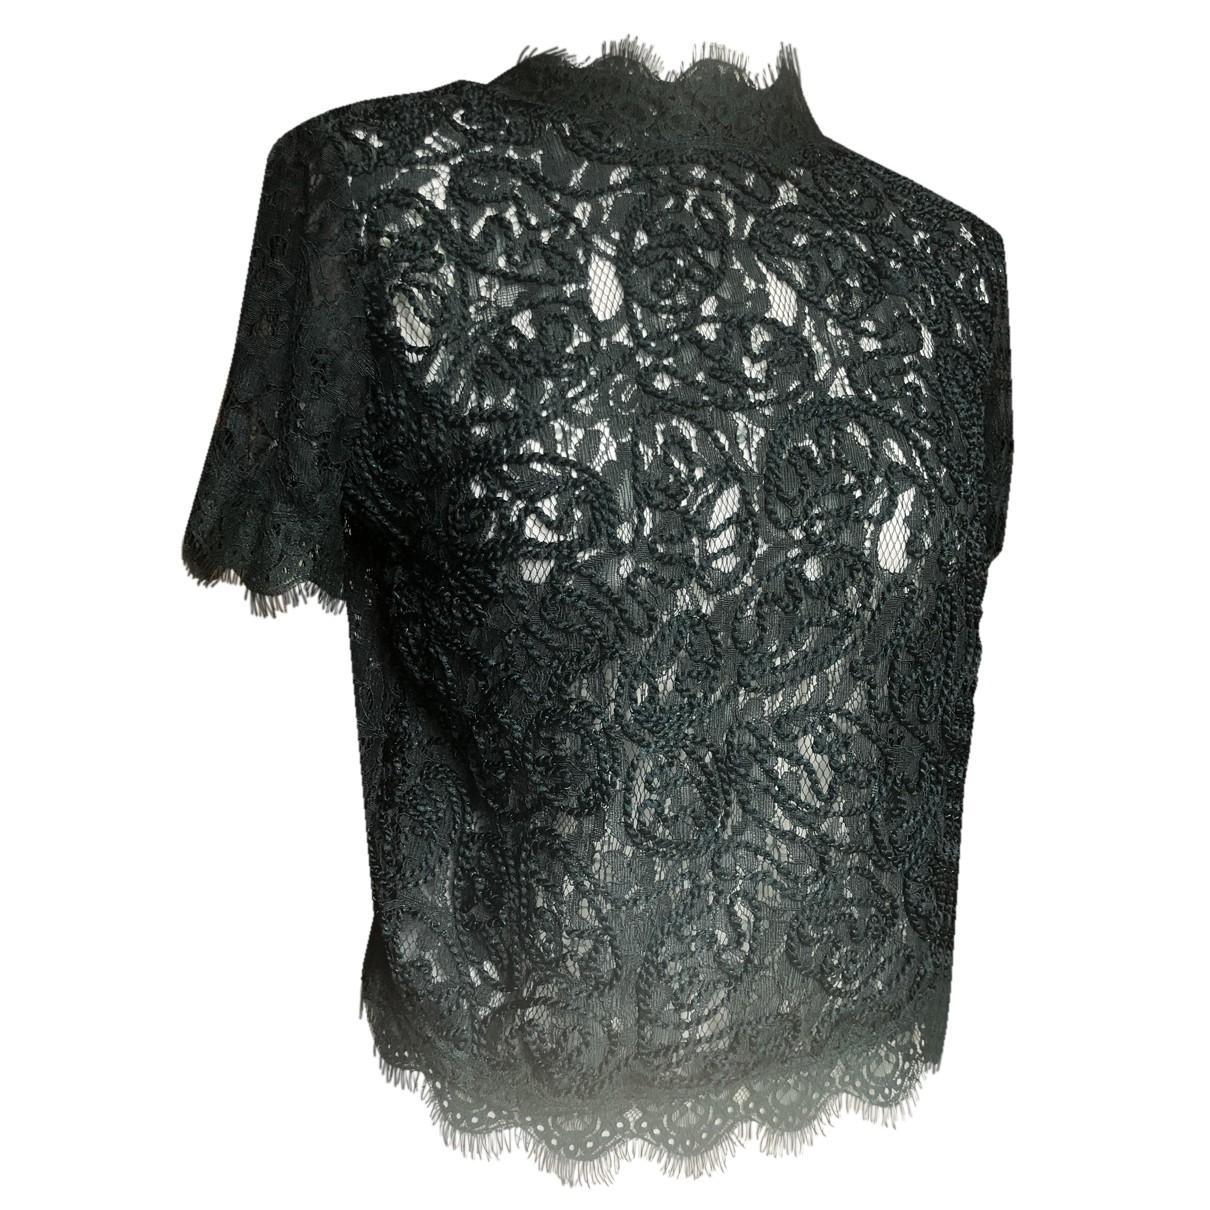 Zara N Green Lace  top for Women M International